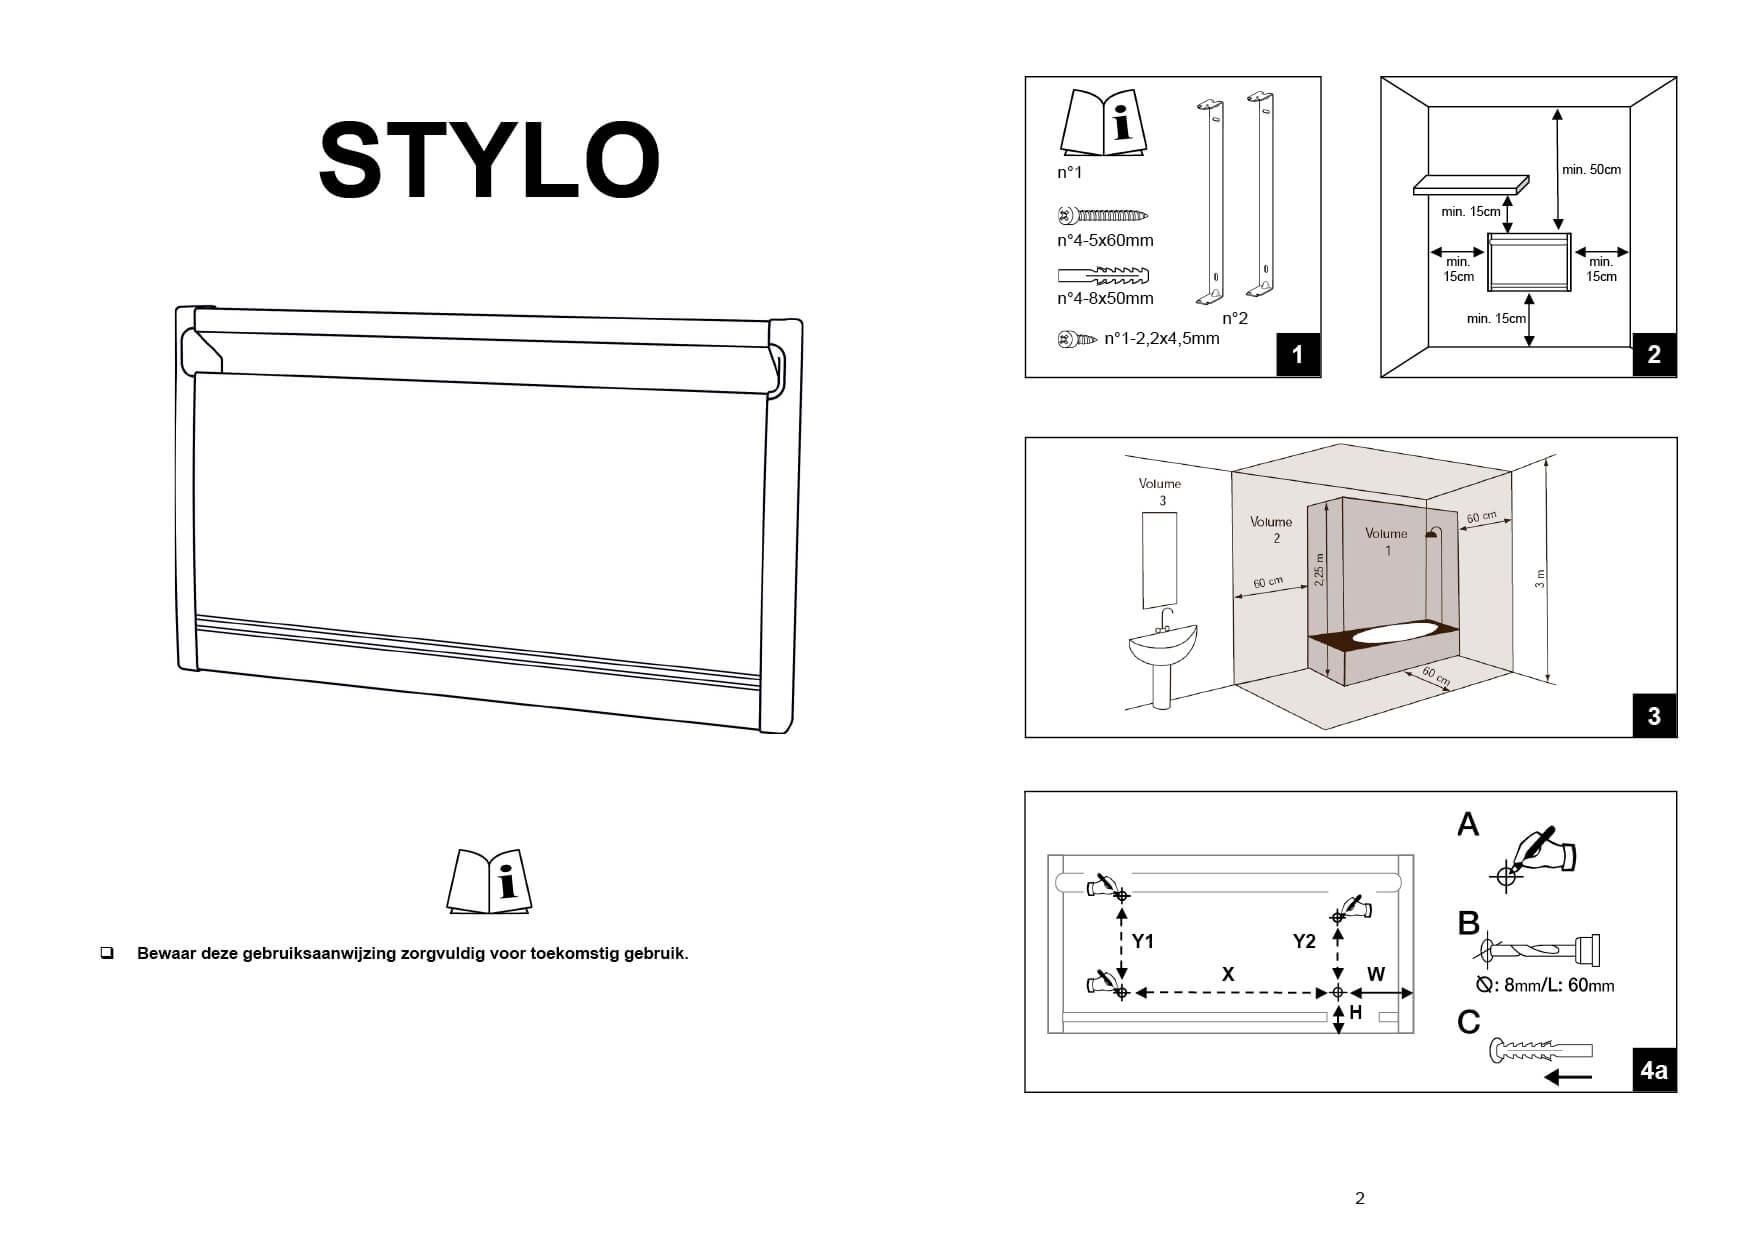 DRL_E-Comfort_Stylo_Gebruiksinstructie_Ned